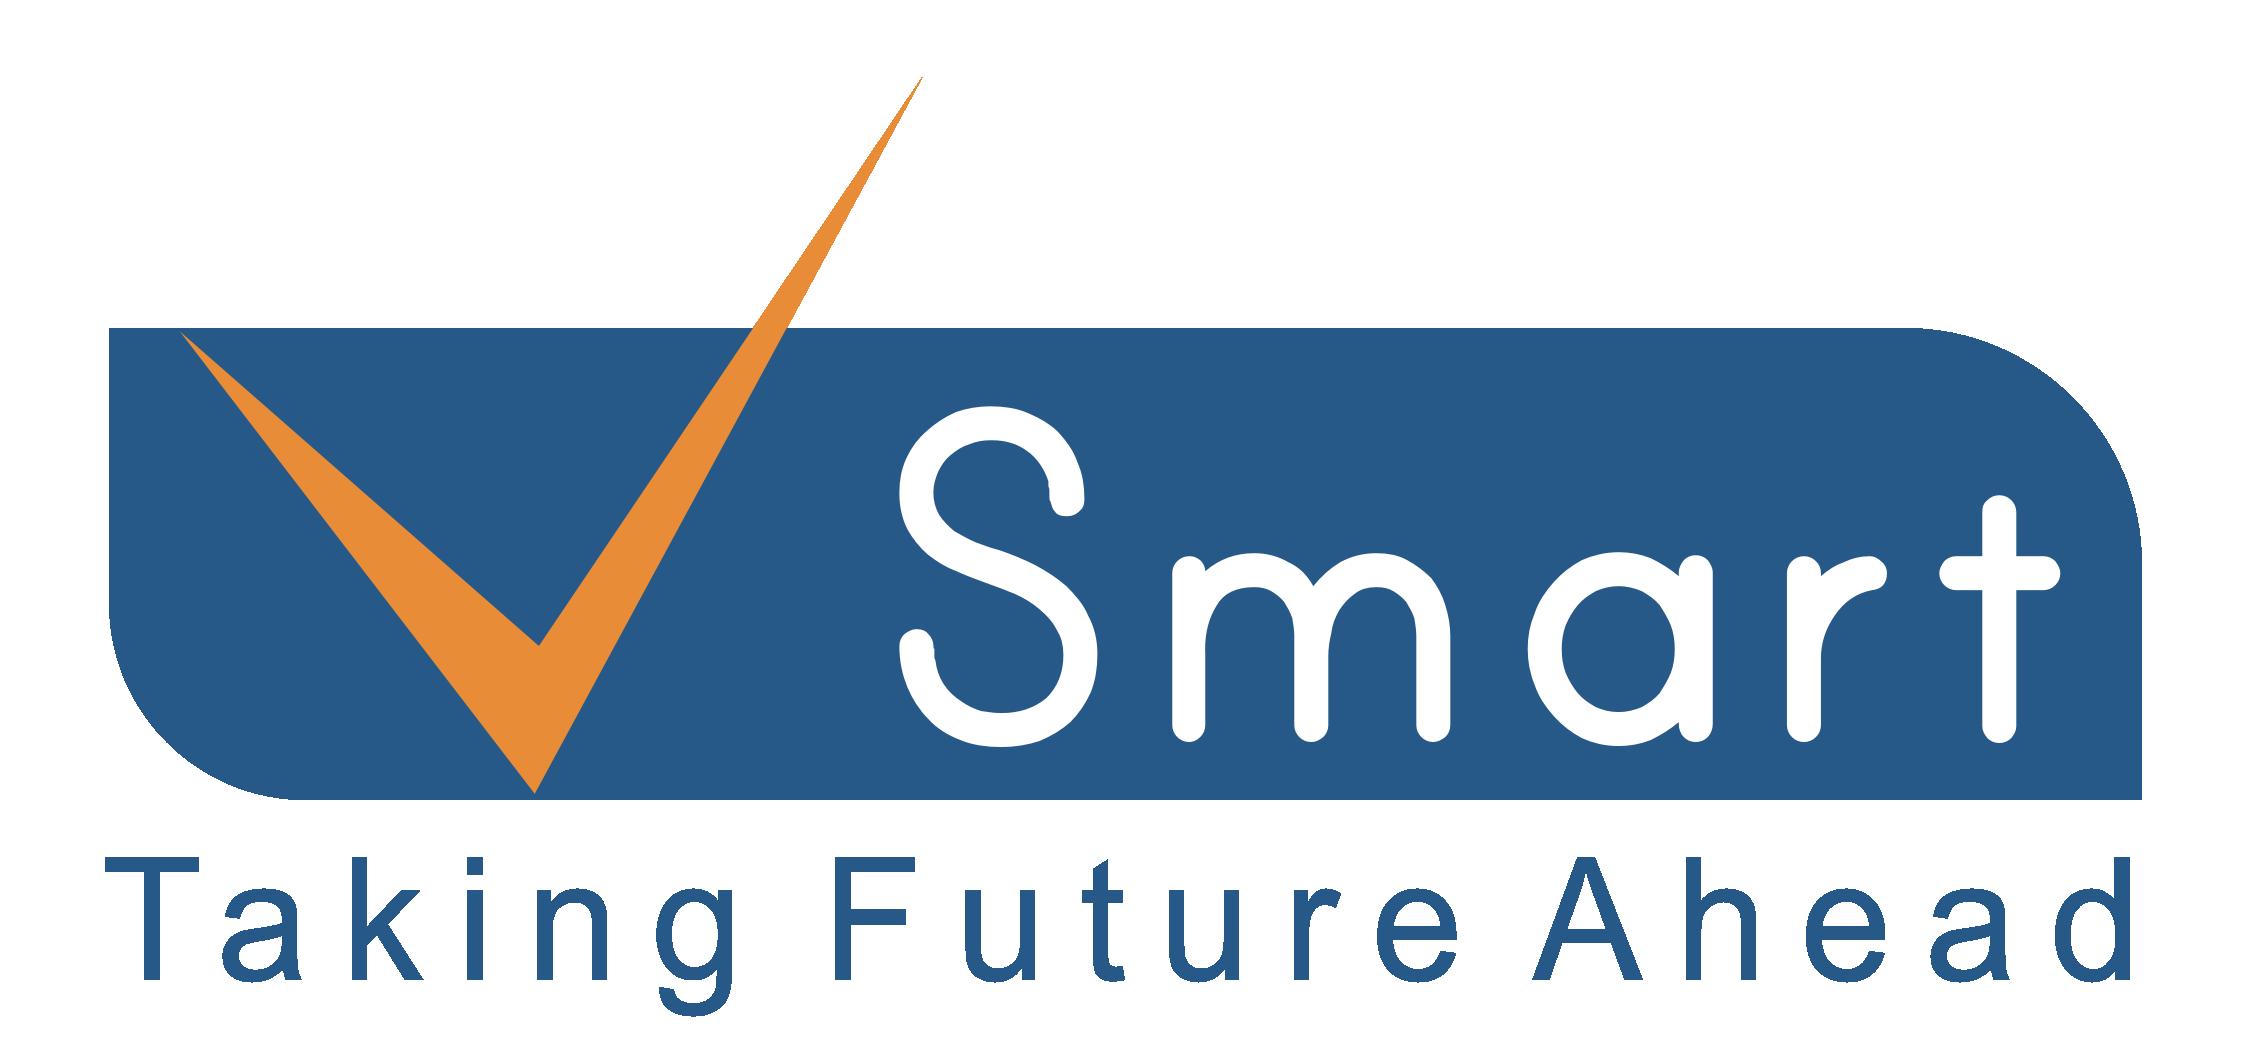 Vsmart Logo